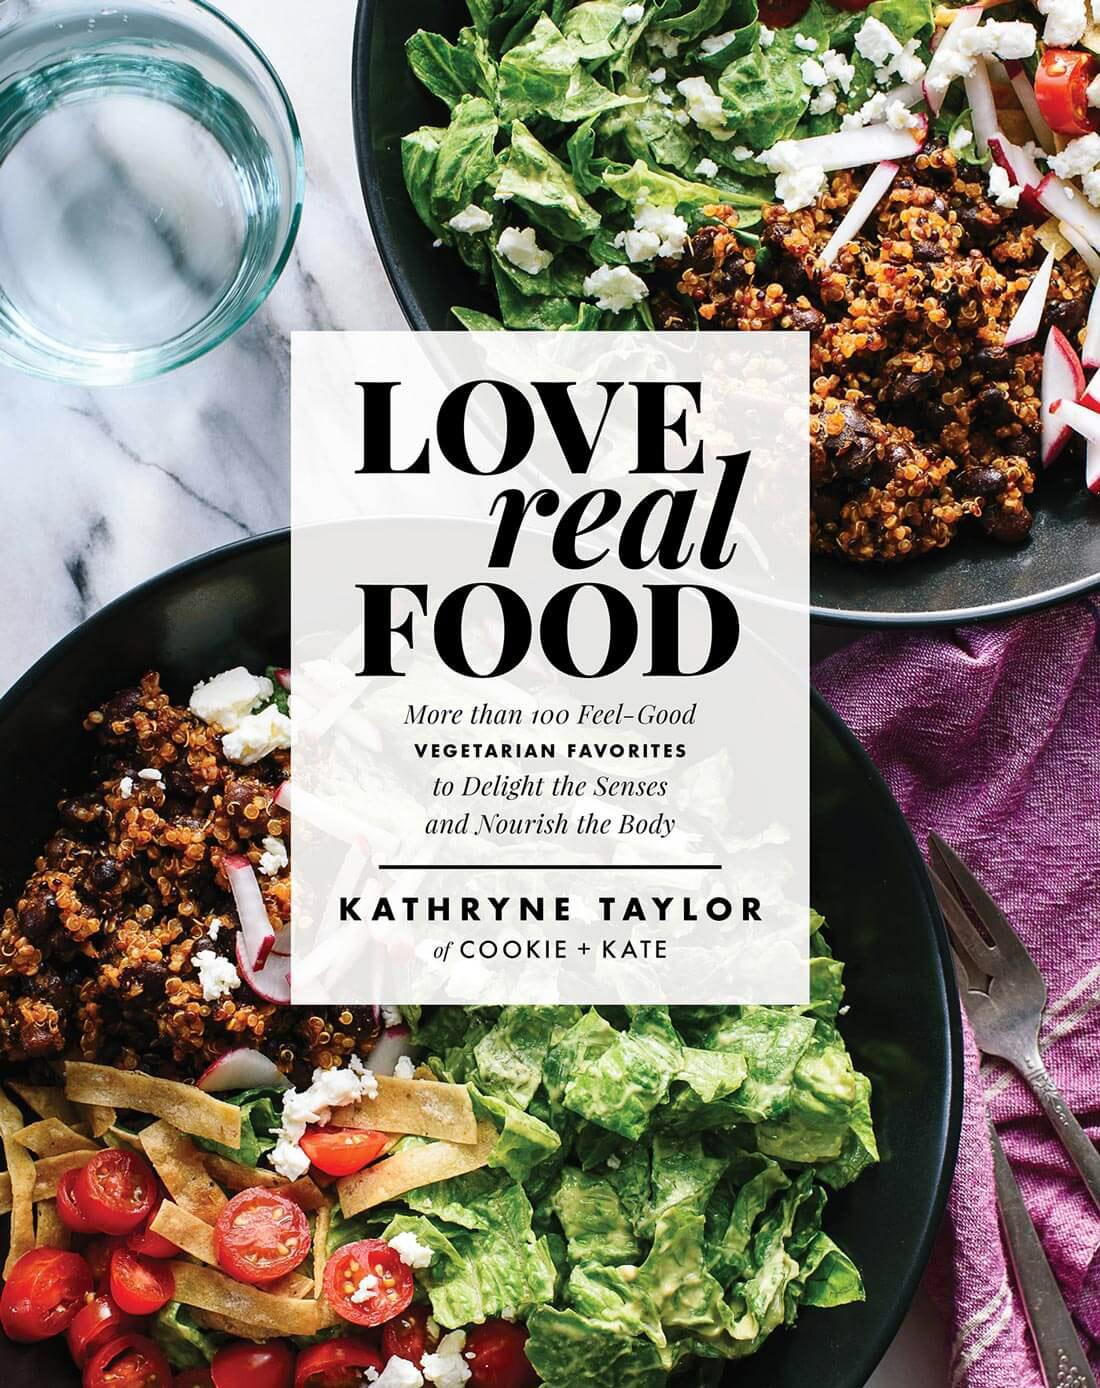 Zestful Kitchen 2017 Holiday Cookbook Gift Guide | Love Real Food Cookbook